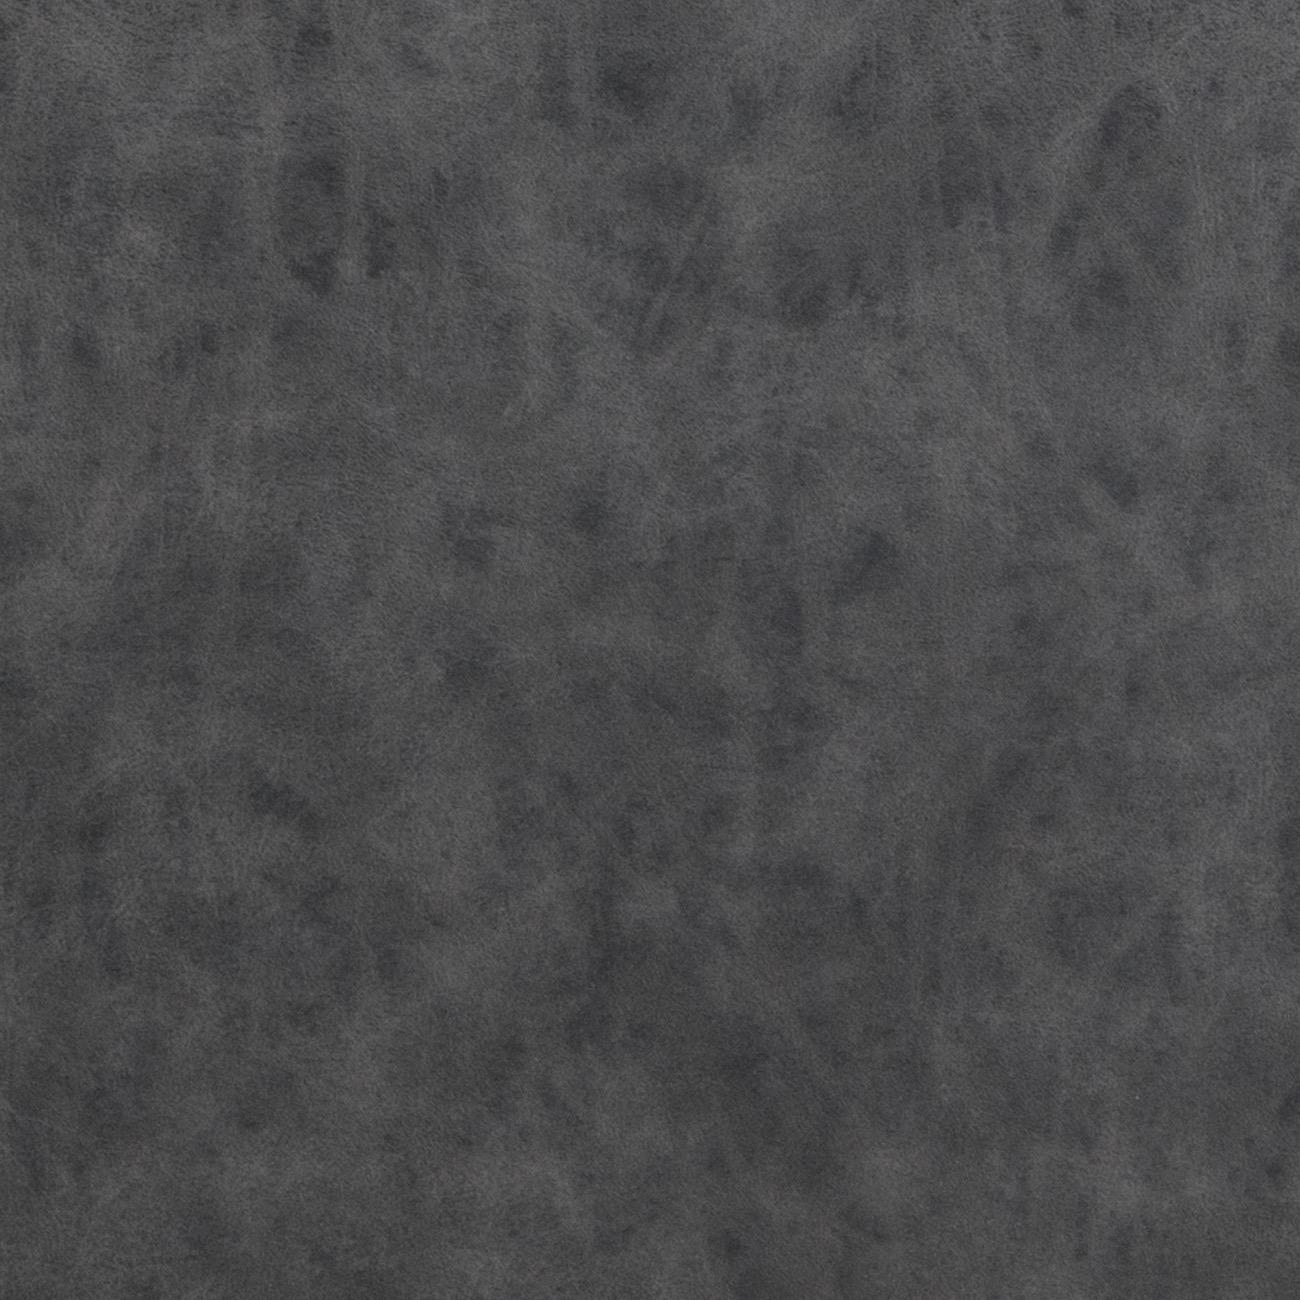 48-034-Faux-Leather-Linen-Storage-Ottoman-Footrest-Bench-Lift-Top thumbnail 33